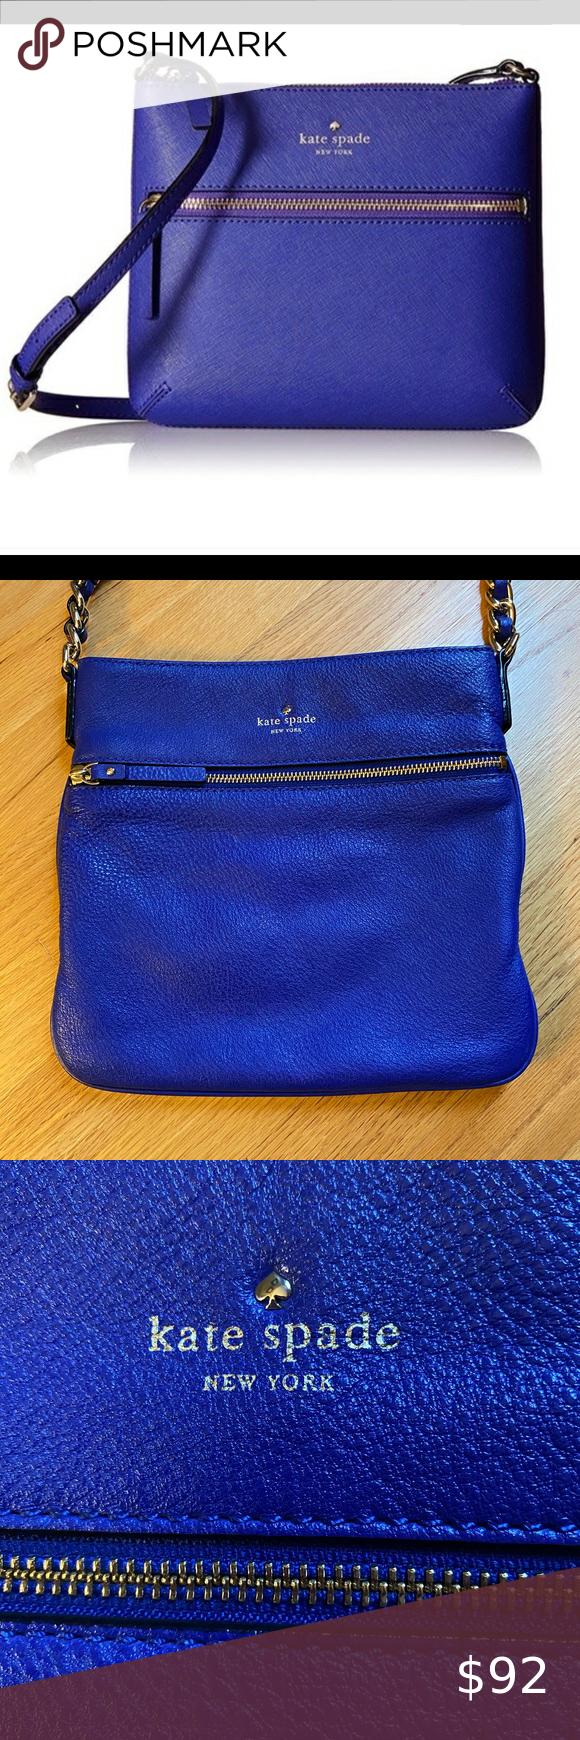 "Speert Designer Evening Bag Jelly Bean Theme Style 4098 Zipper 4 Pockets 12/""Inch"